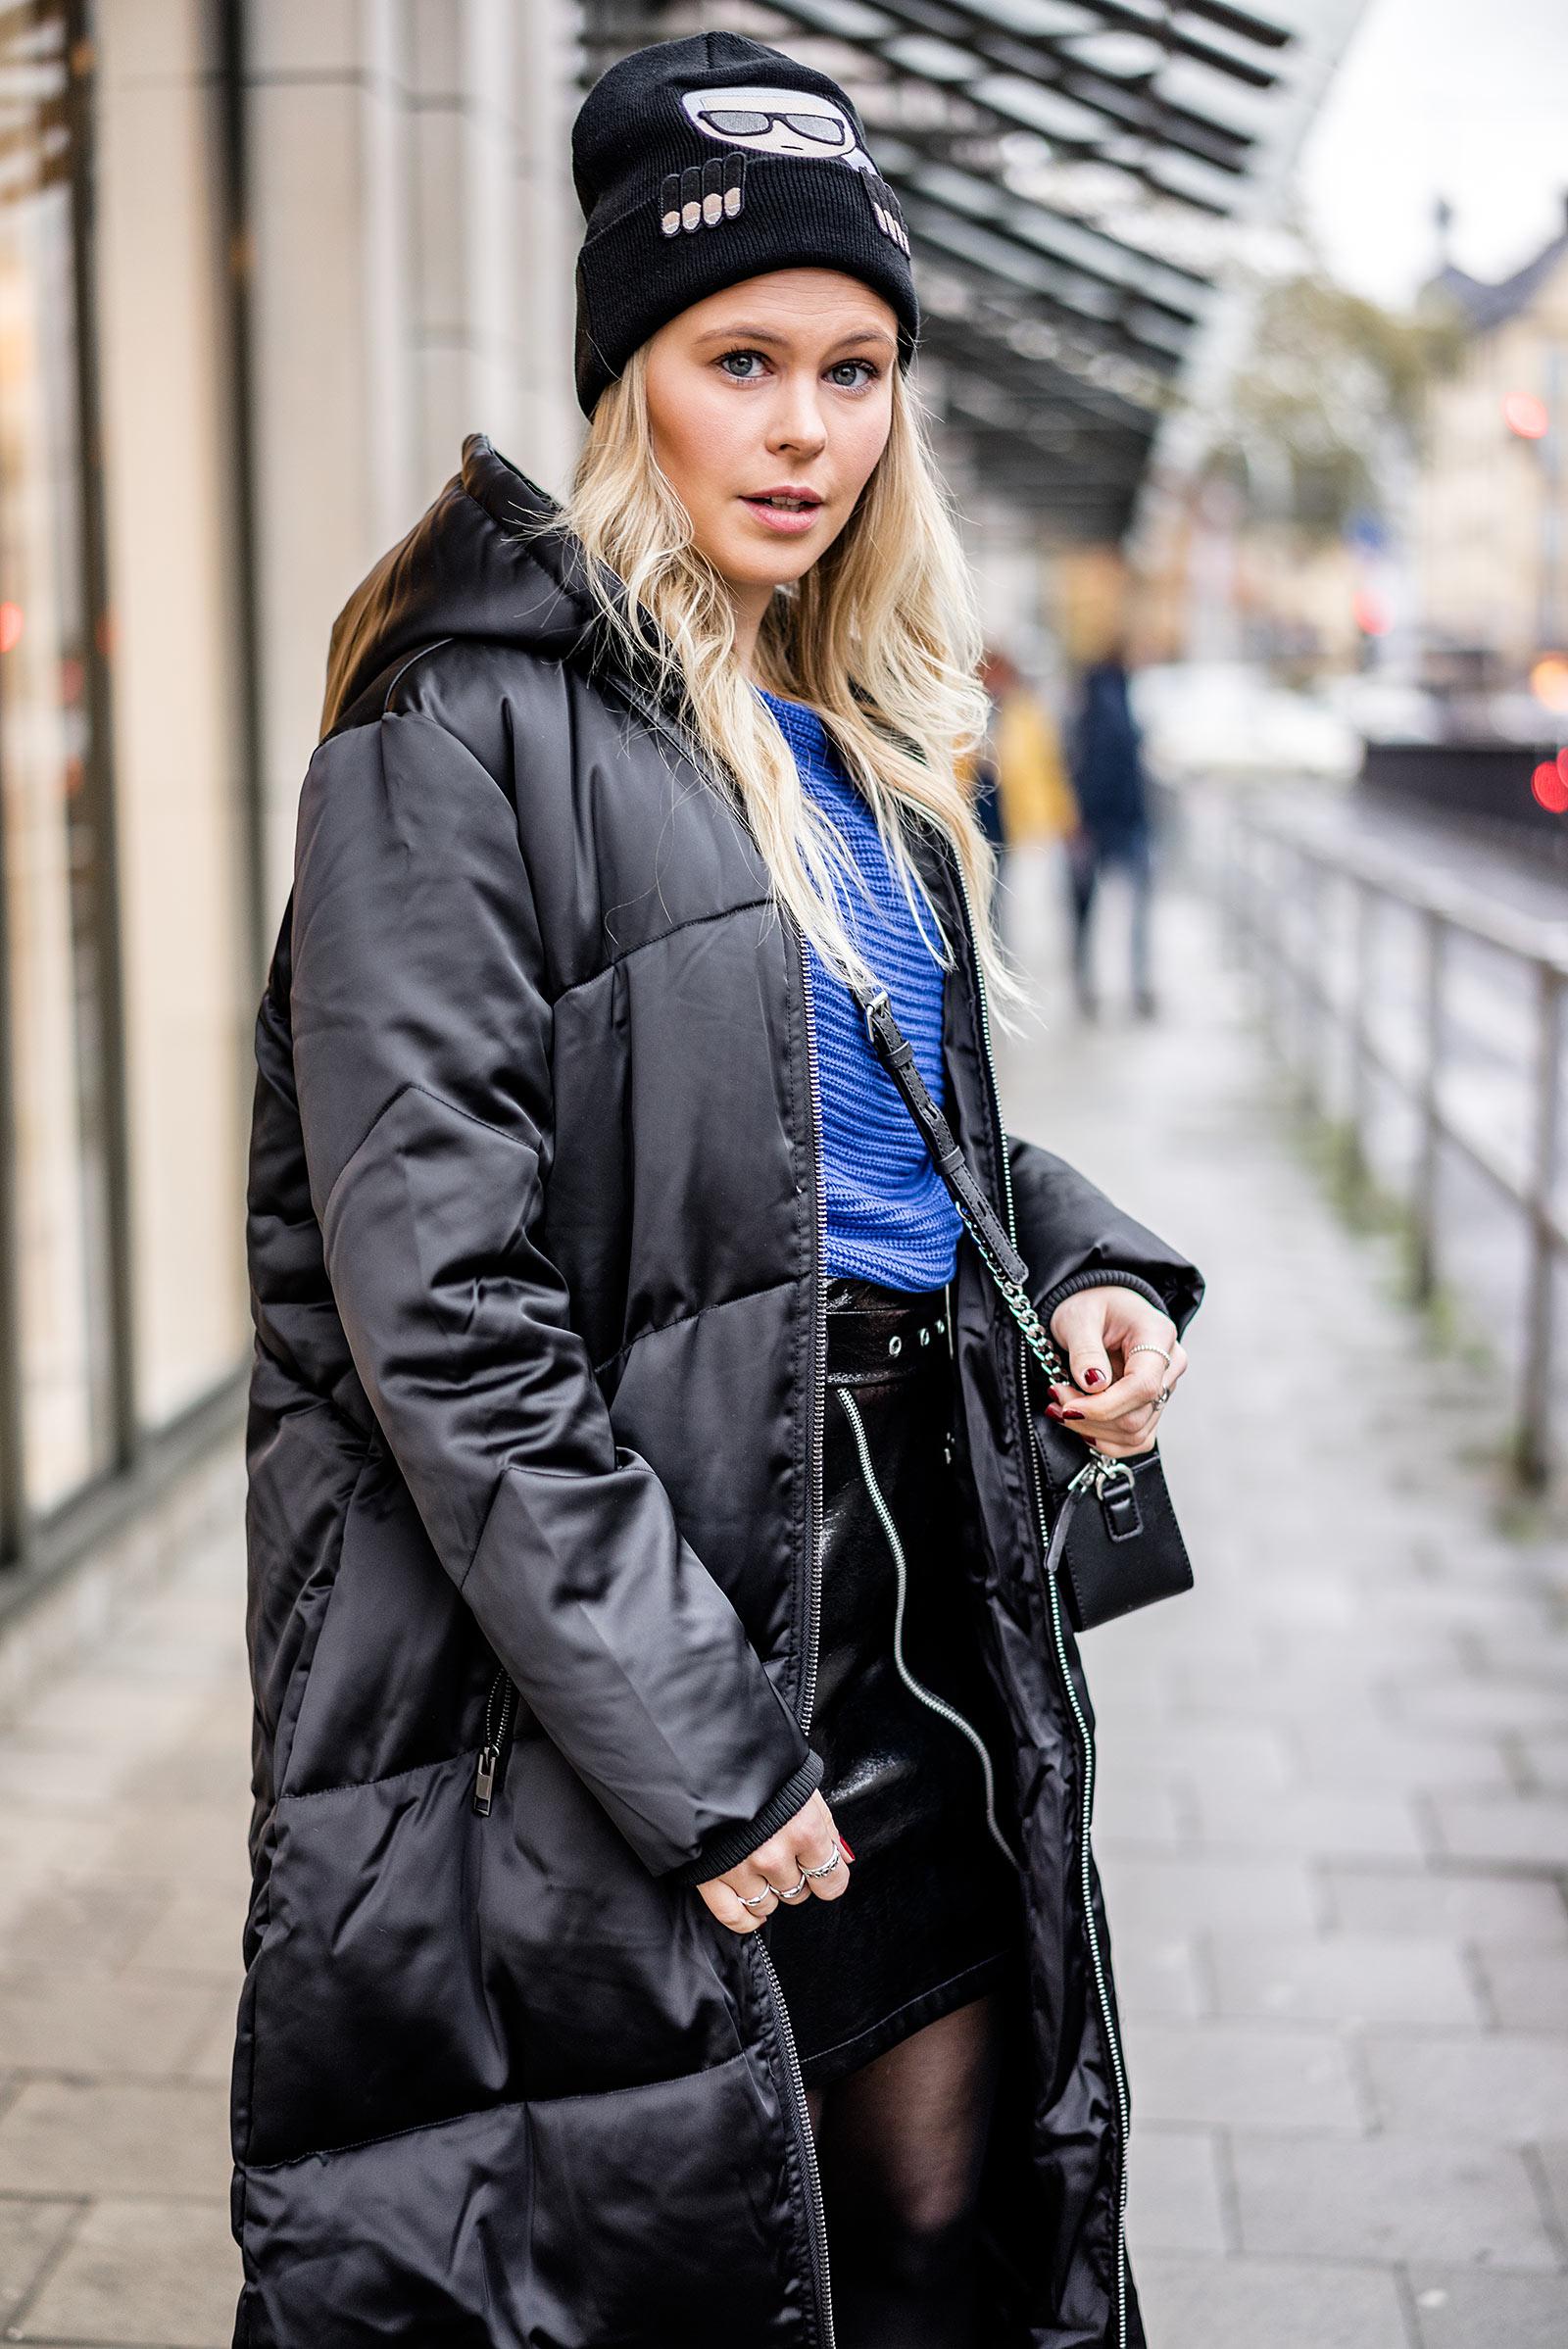 Daunenmantel schwarz Outfit Trend Modeblog Sunnyinga